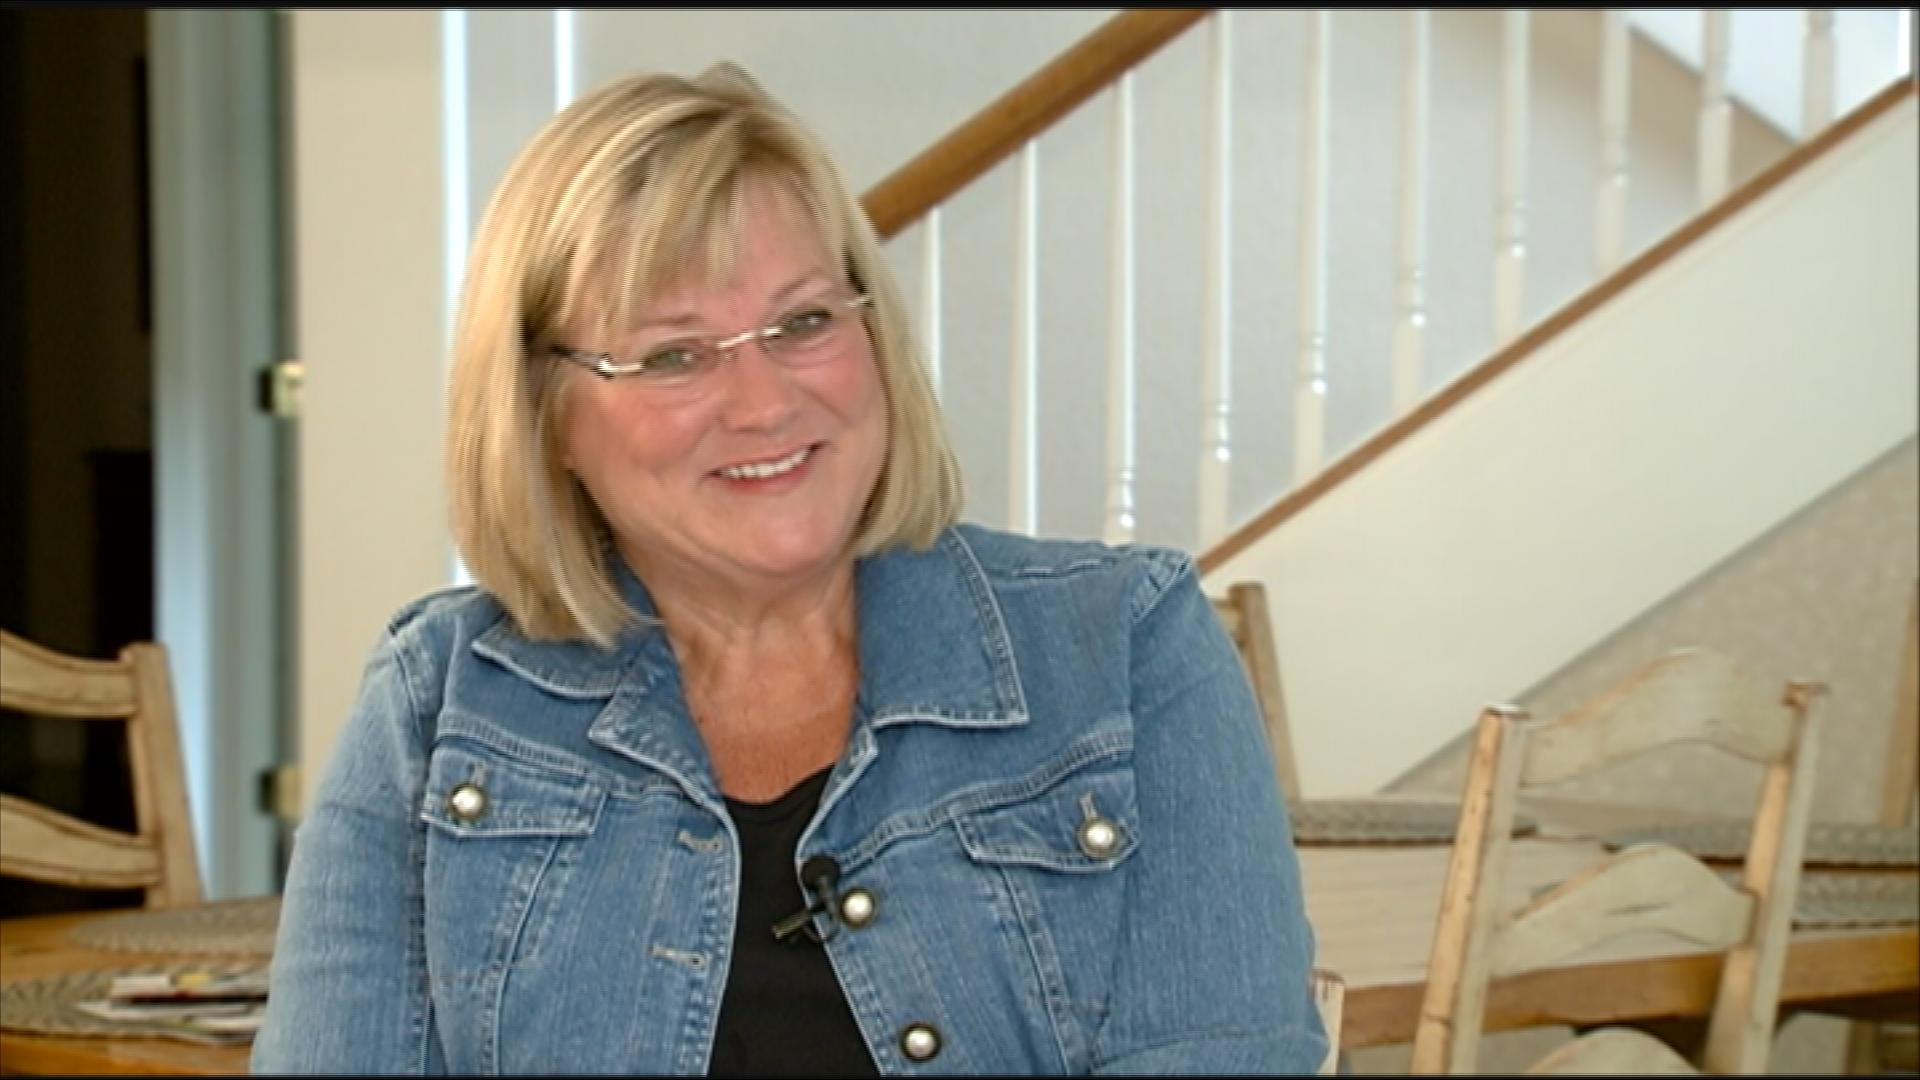 Kirk Ferentz's wife Mary Ferentz